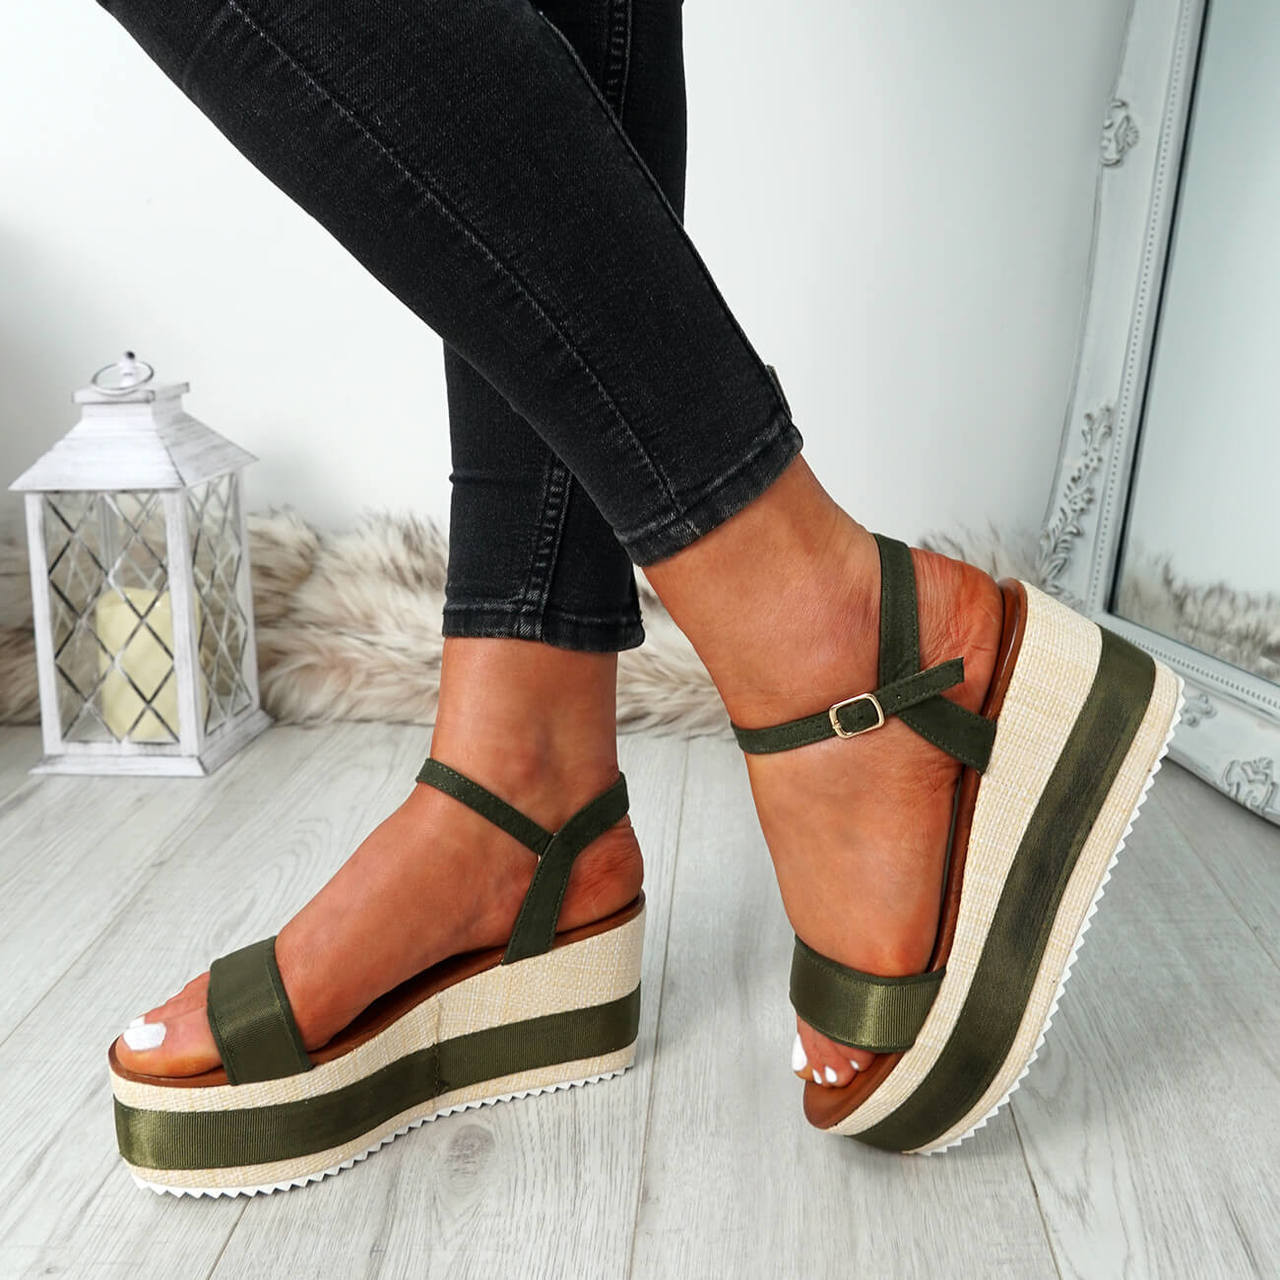 720f76cb024 Womens Ladies Platform Flatforms Sandals Ankle Strap Peep Toe Heels Shoes  Size